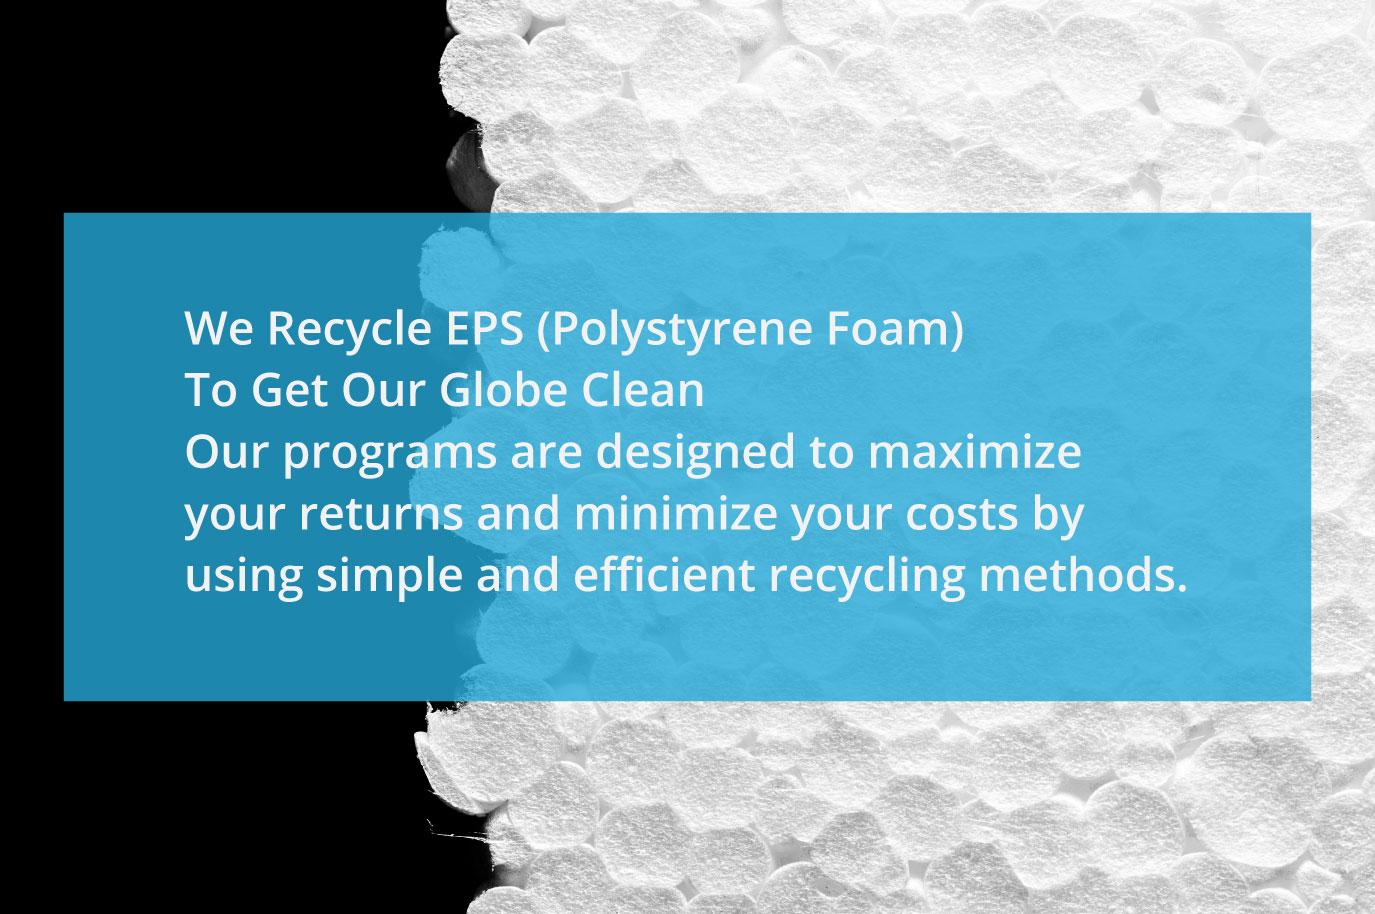 Home Interone Plastics Vancouver Styrofoam Recycle Eps Polystyrene Foam Recycle